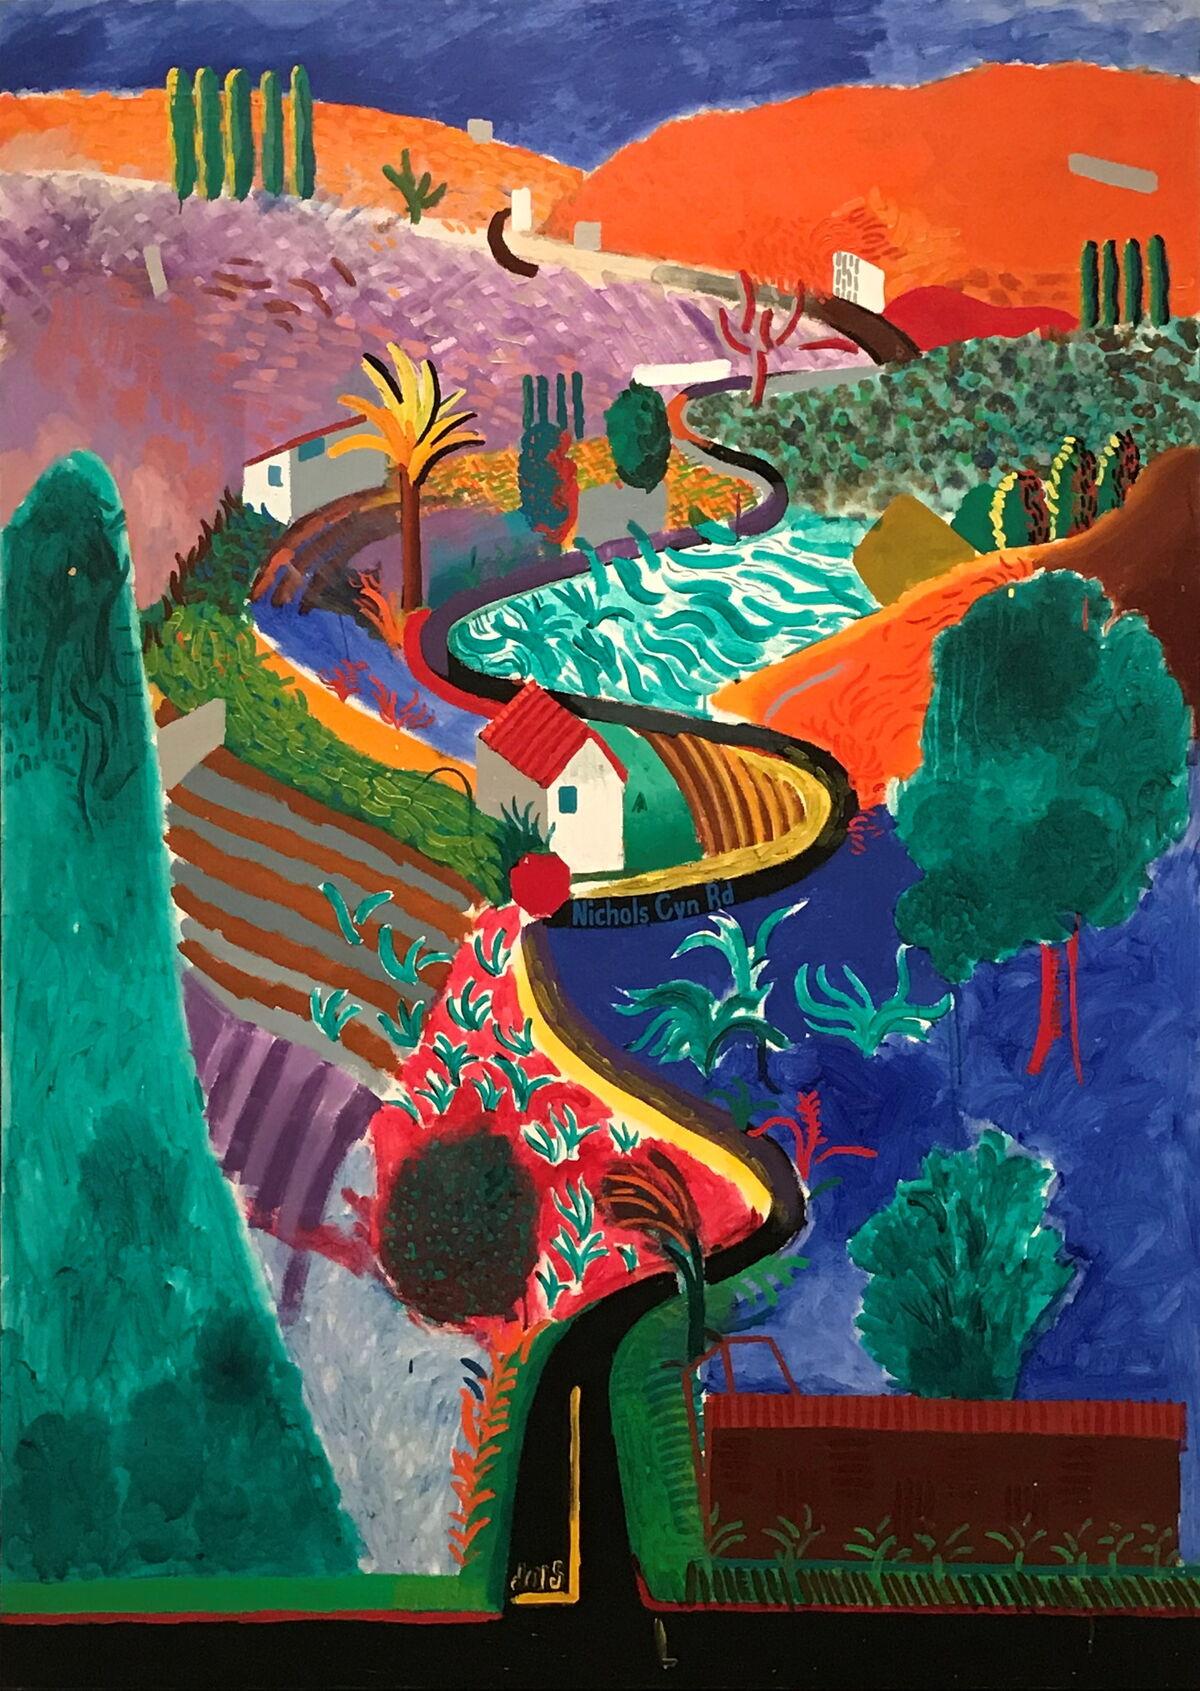 David Hockney's Nichols Canyon (1980). Courtesy Phillips.